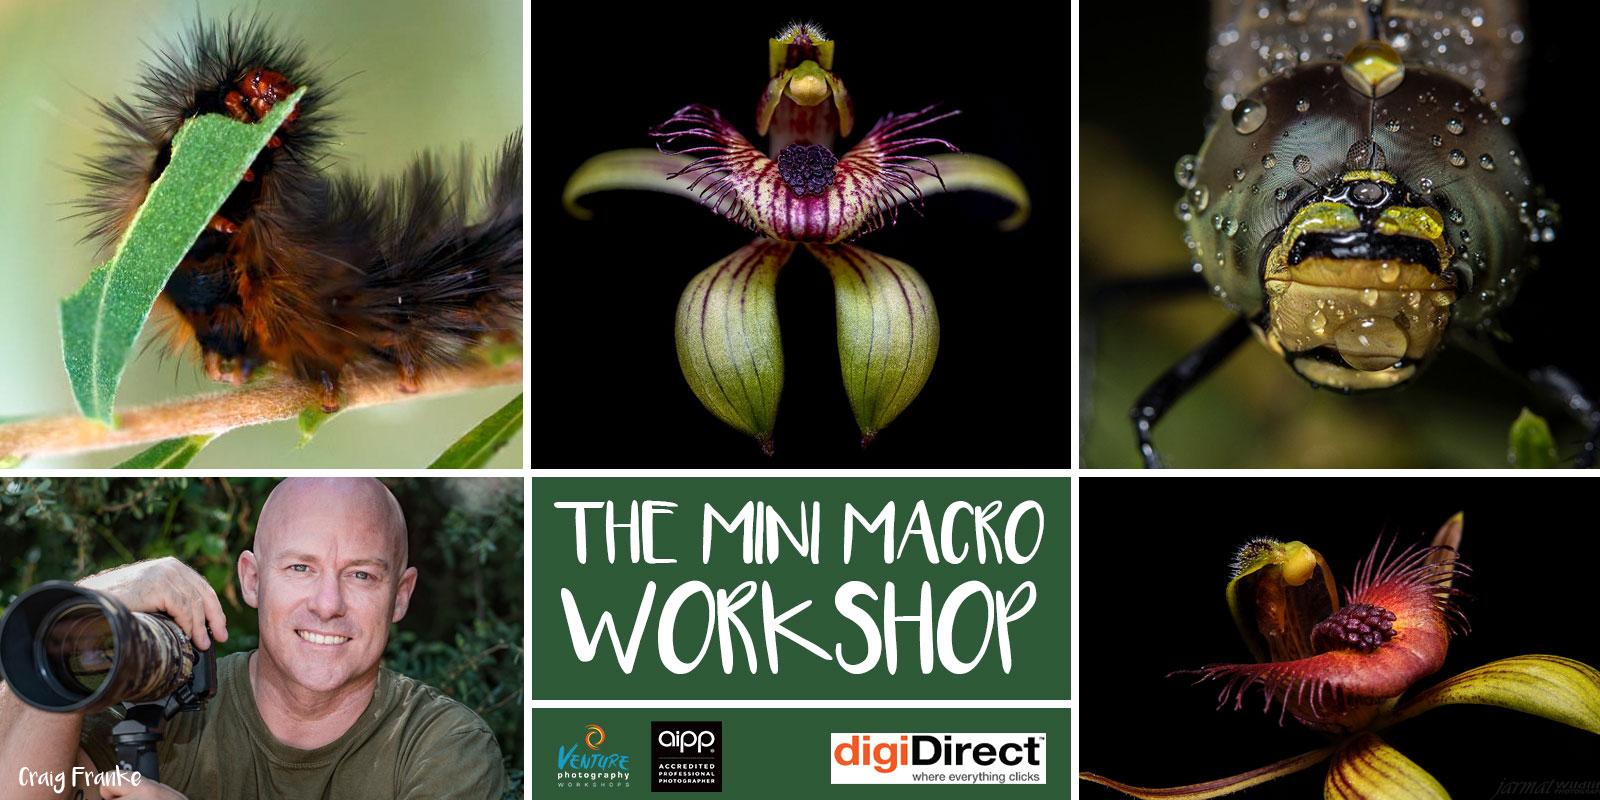 The Mini Macro Workshop